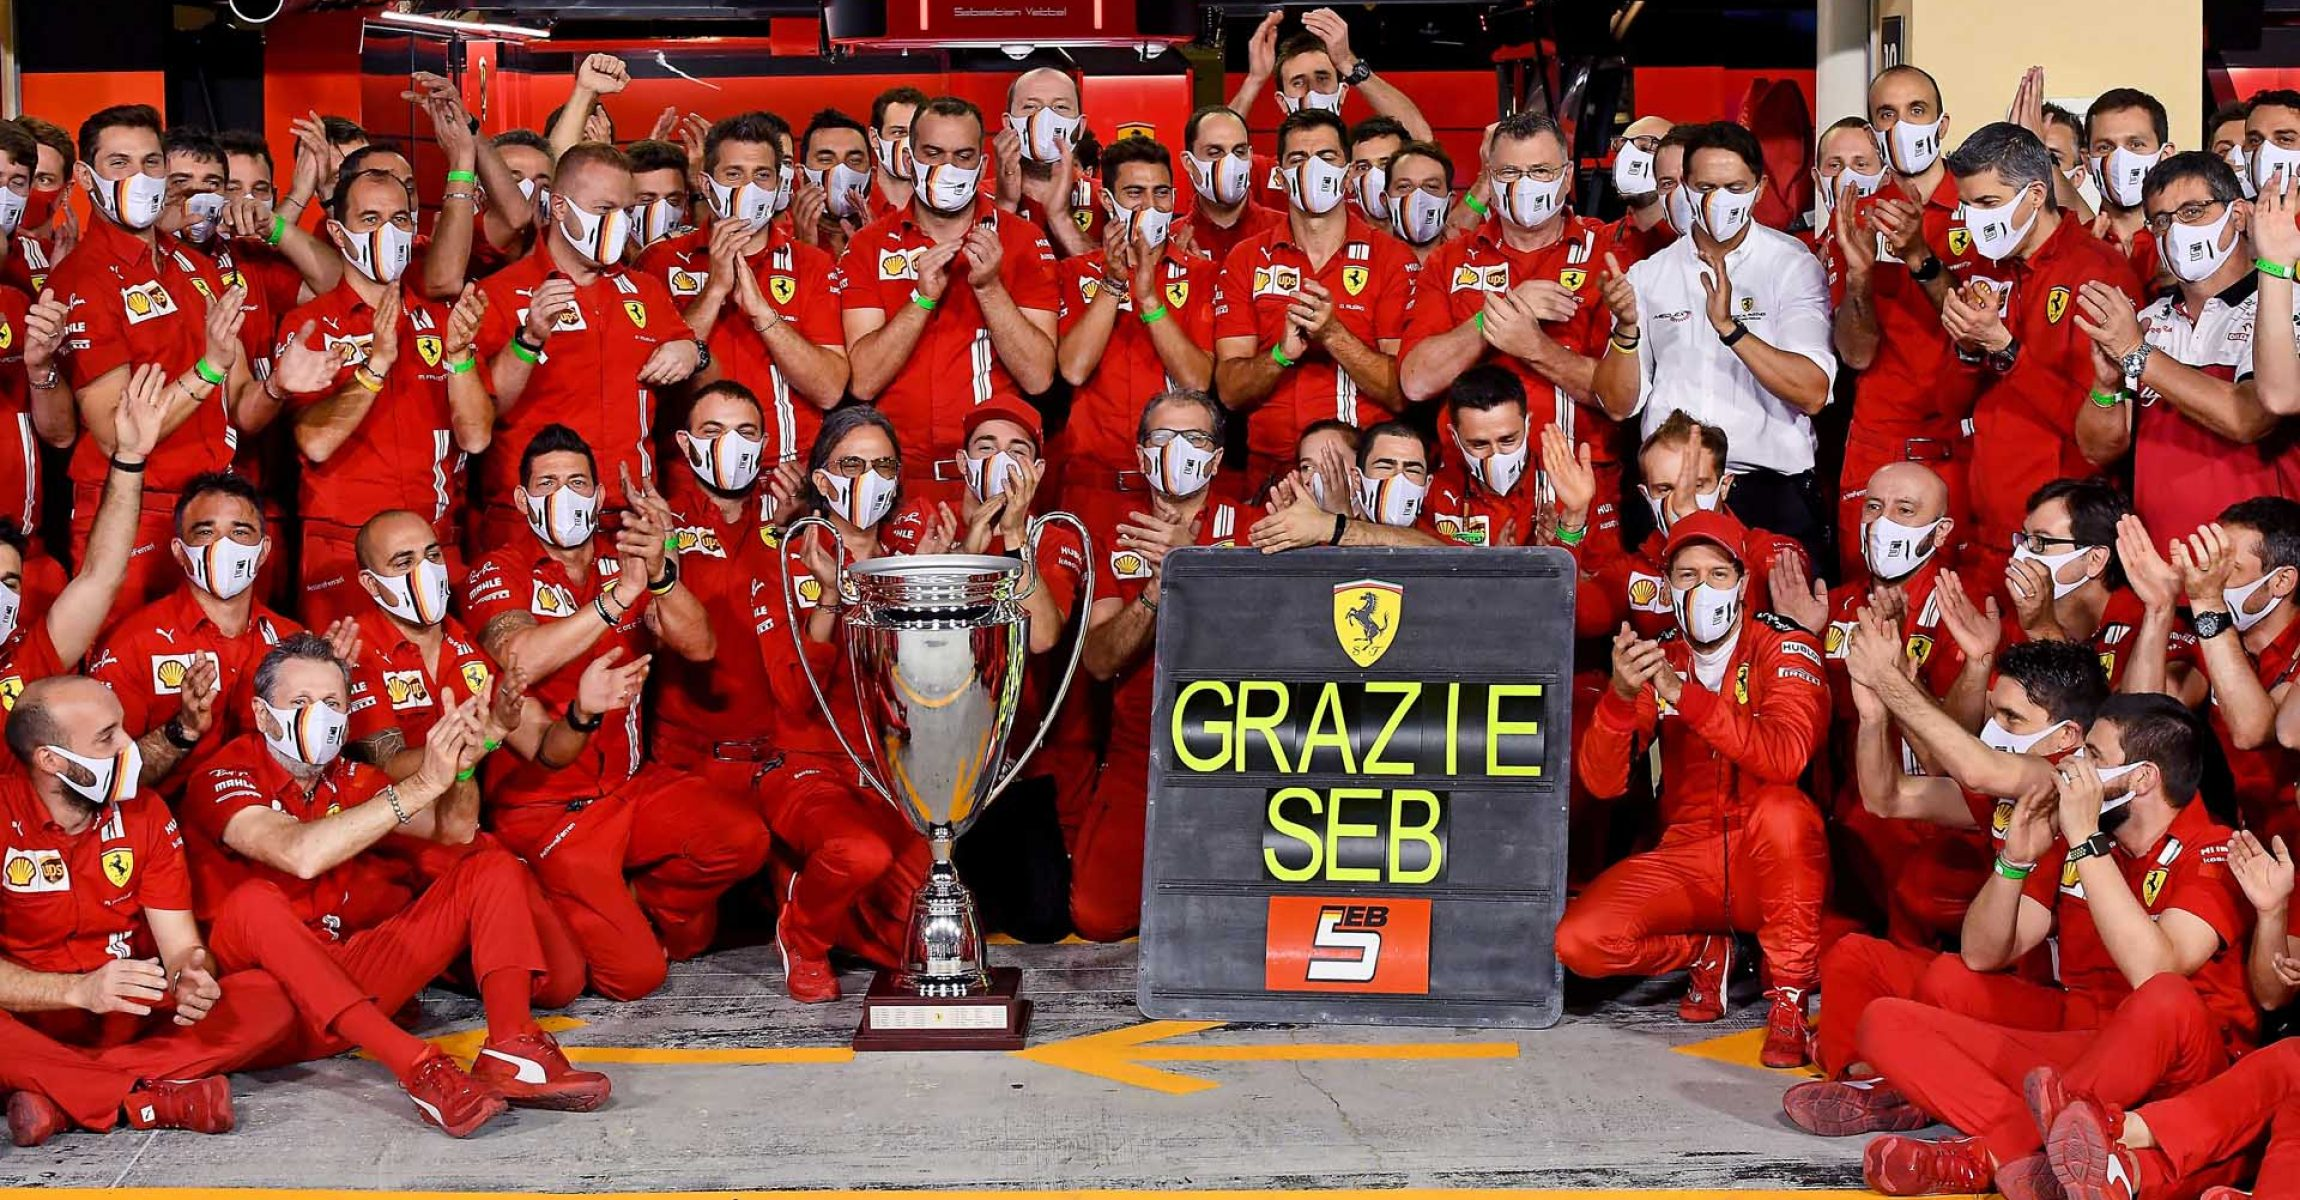 GP ABU DHABI  F1/2020 - DOMENICA  13/12/2020    credit: @Scuderia Ferrari Press Office Grazie Seb Sebastian Vettel Ferrari